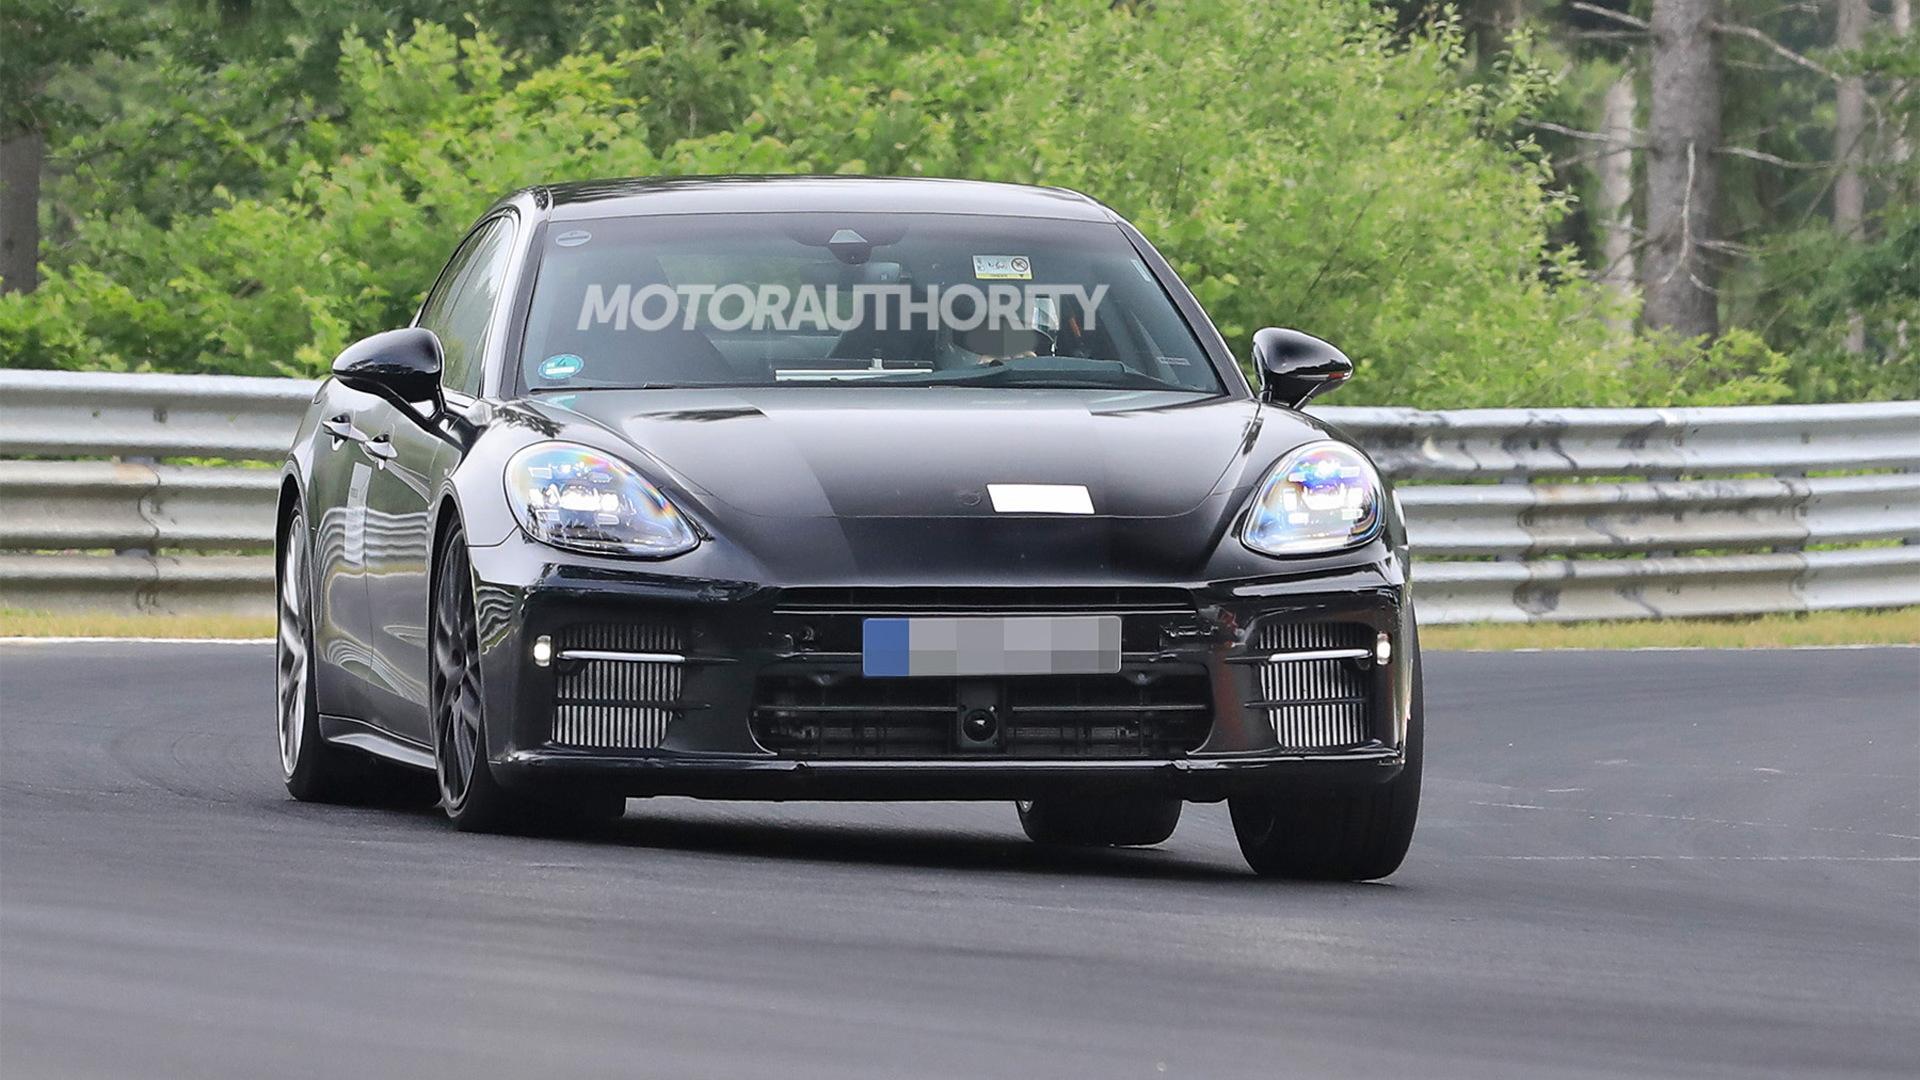 2023 Porsche Panamera second facelift spy shots - Photo credit: S. Baldauf/SB-Medien